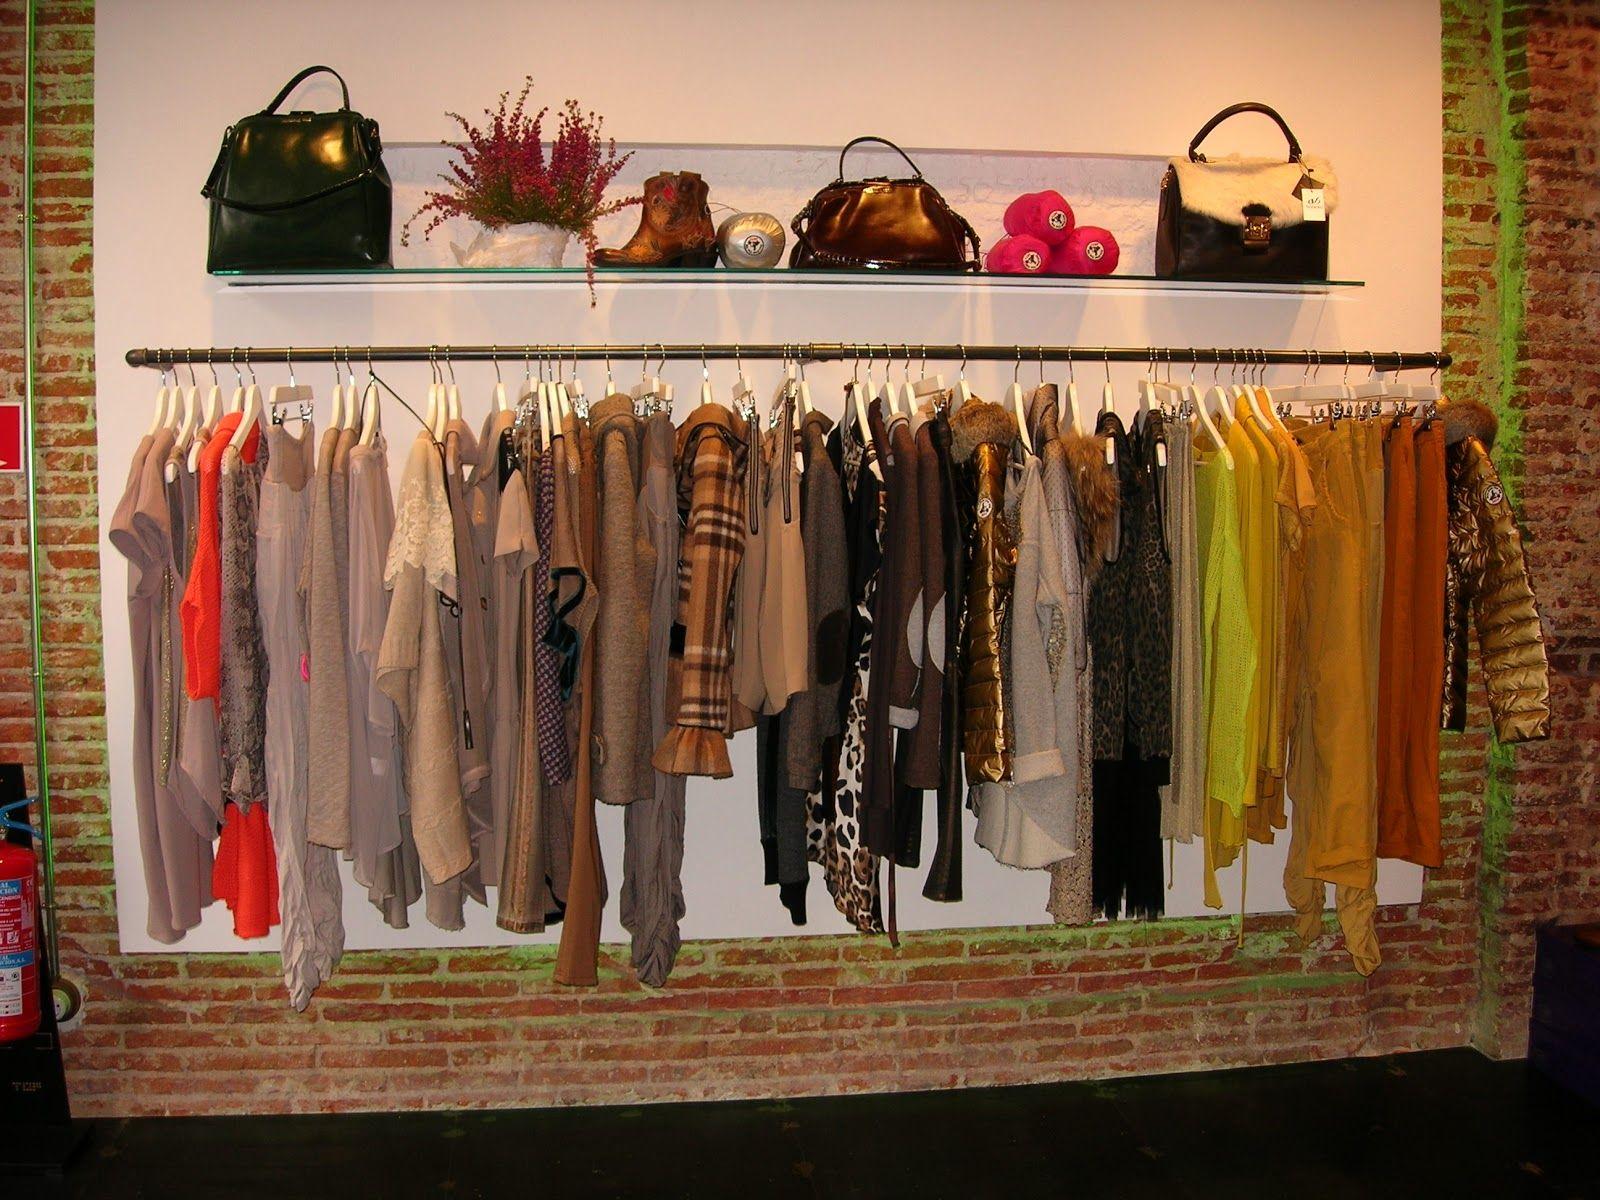 Dise os de probadores de ropa buscar con google mi for Decoracion de interiores locales de ropa